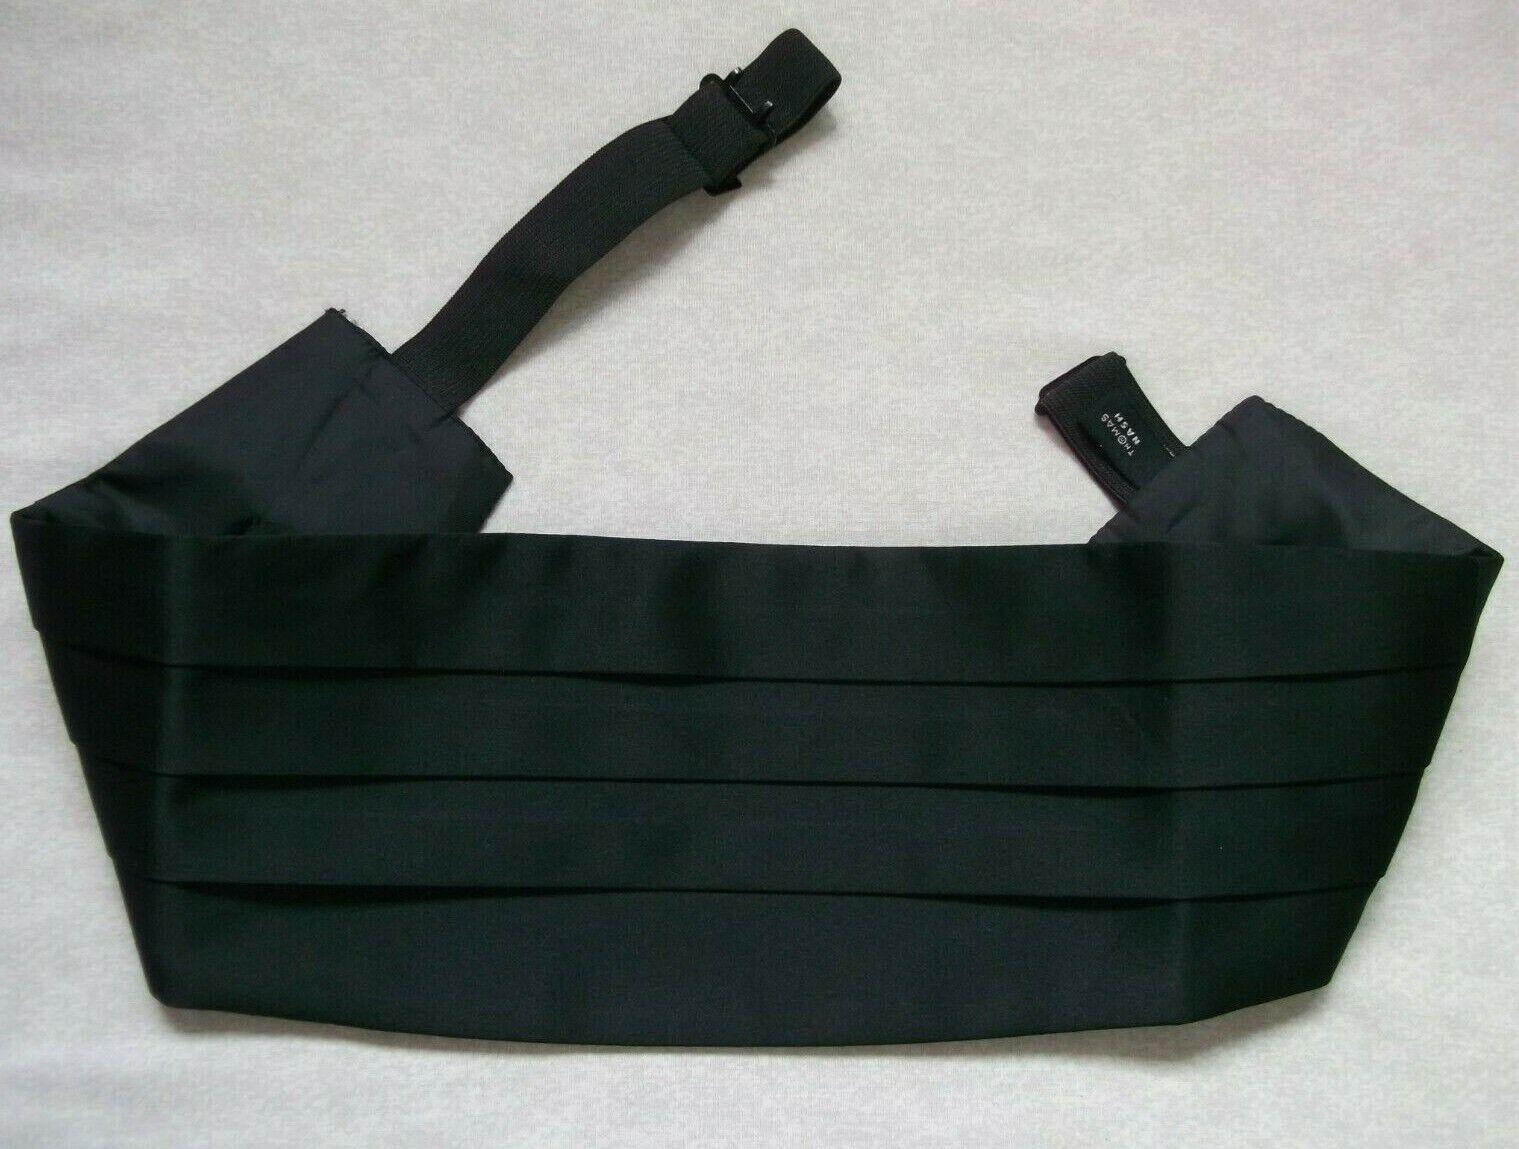 Cummerbund Mens Pleated Sash SOLID BLACK by Thomas Nash Adjustable to 34